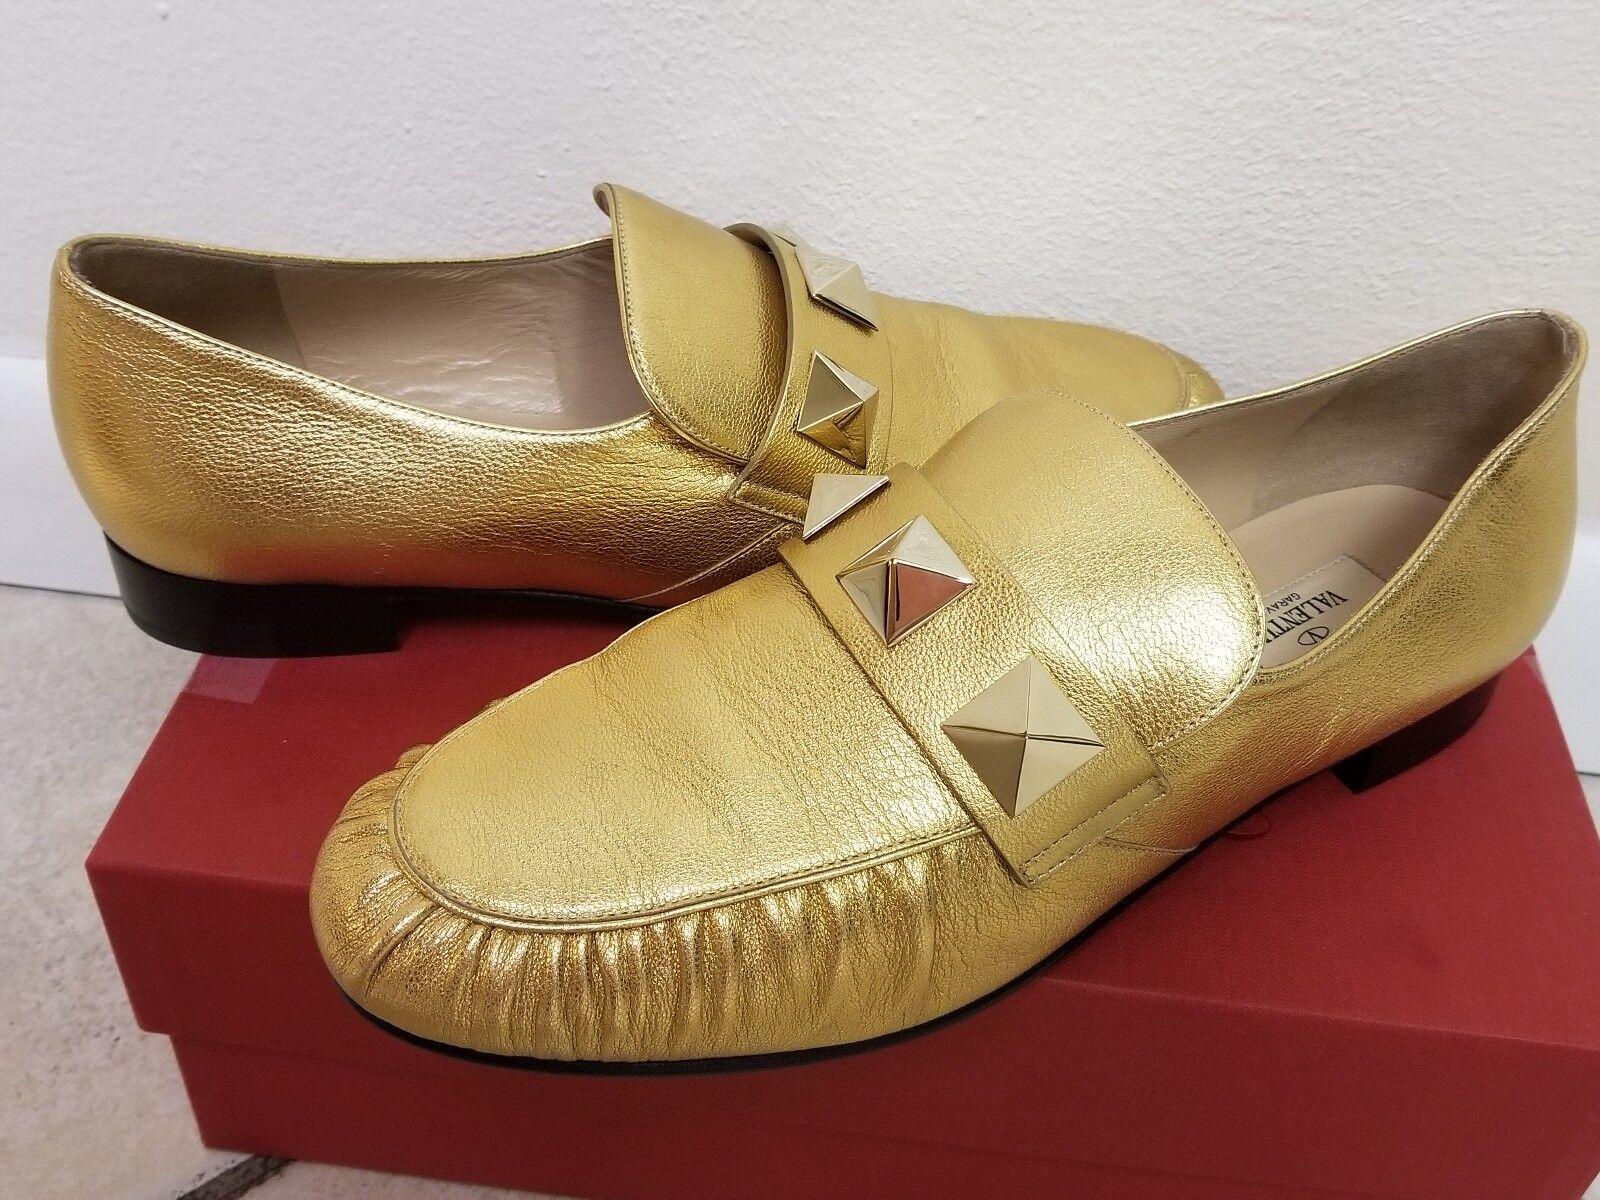 Valentino Garavani Rockstud Metallic Leather Loafer gold sz 40.5 NEW shoes